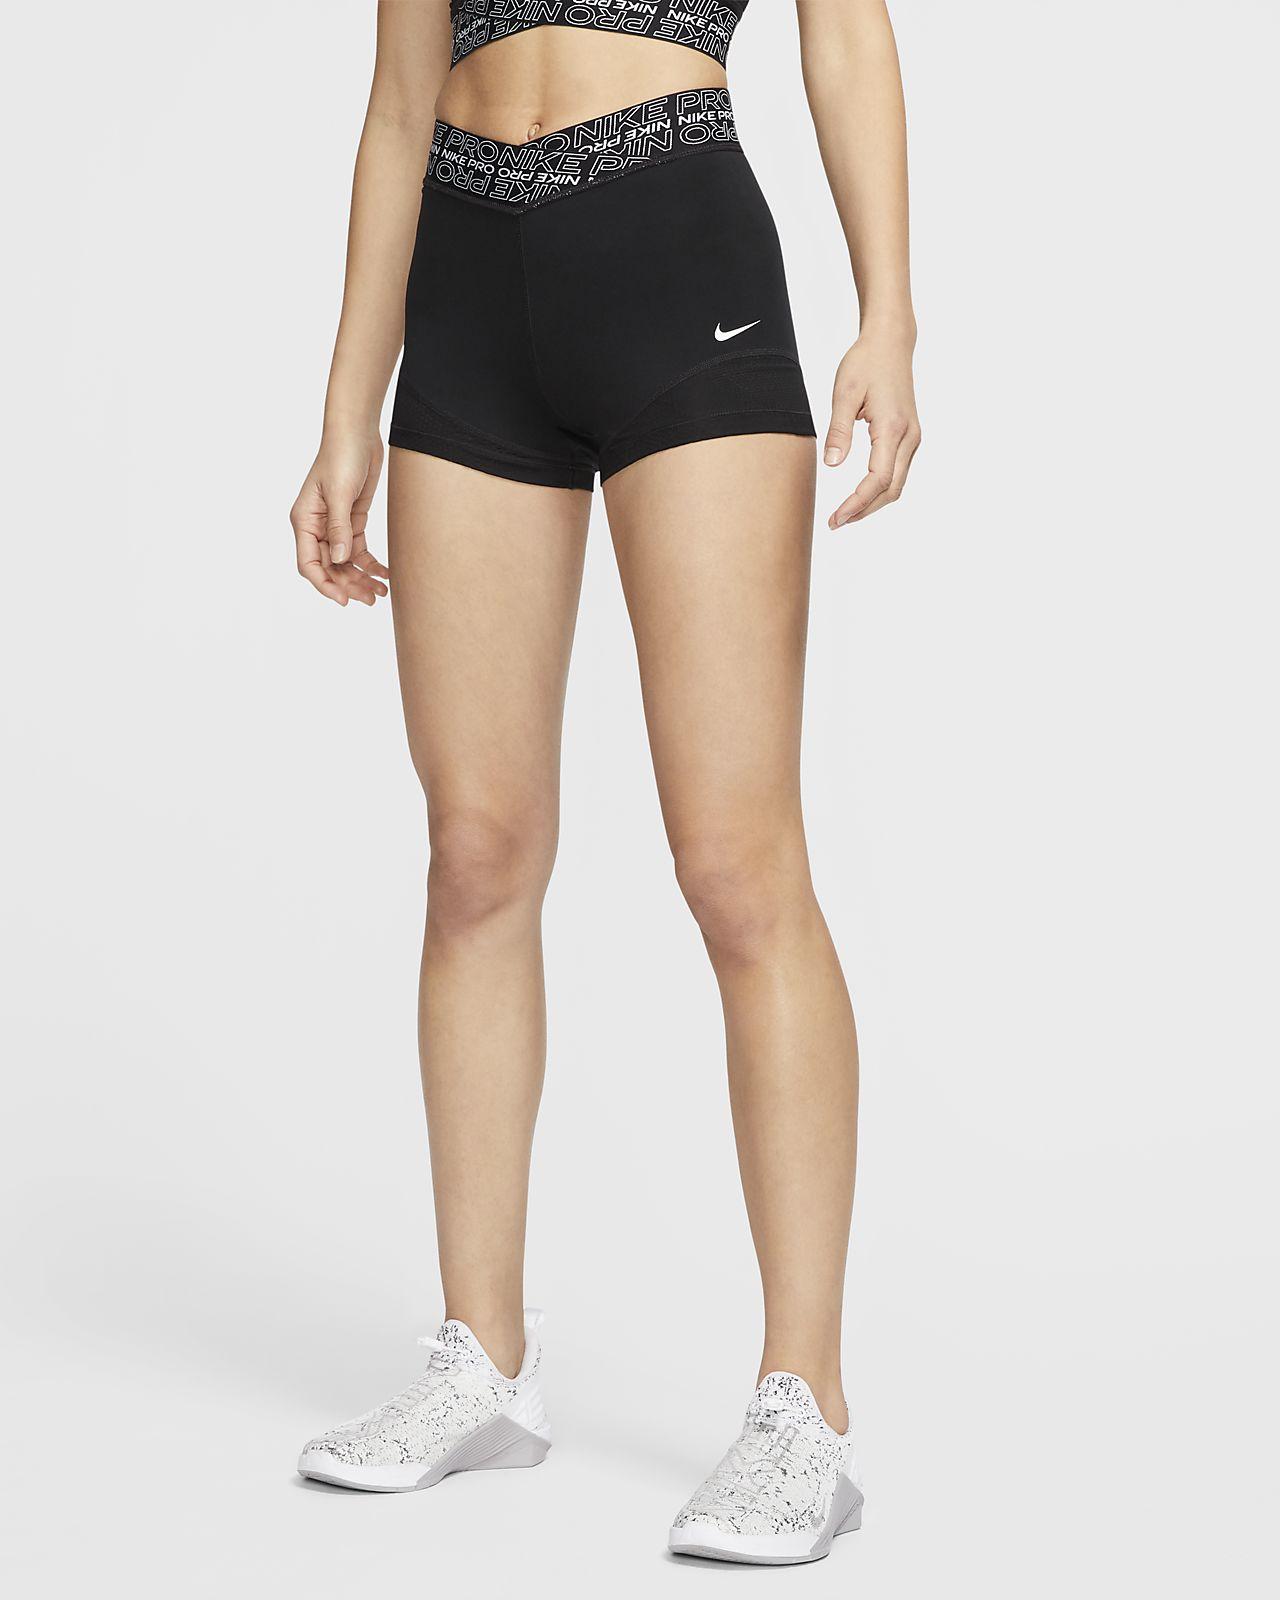 Dámské 7,5cm kraťasy Nike Pro